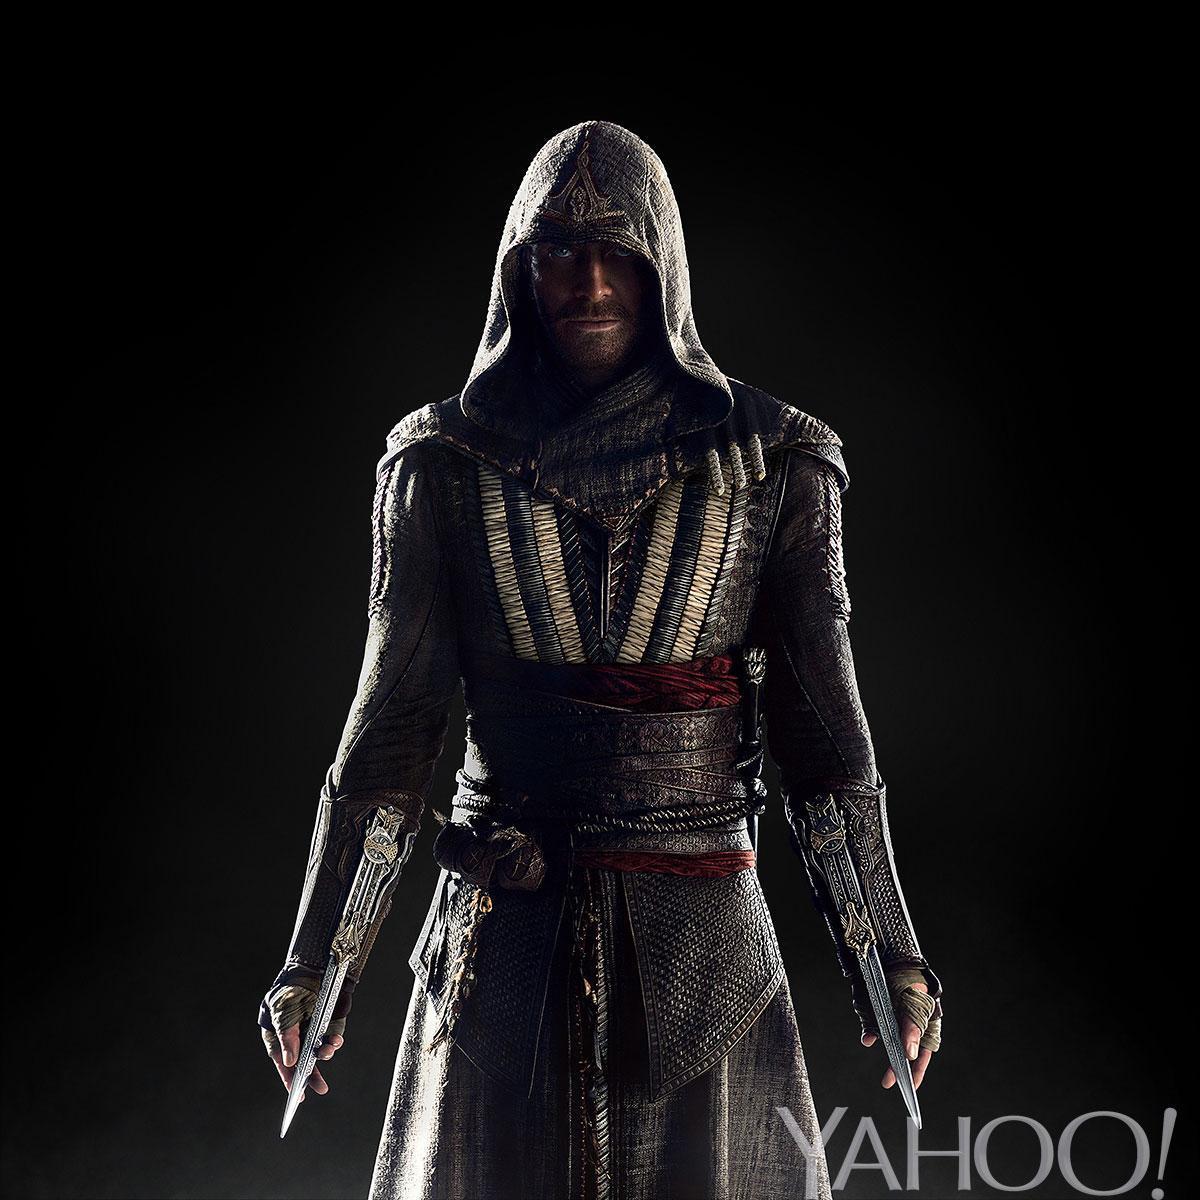 AssassinS Creed Film Cda